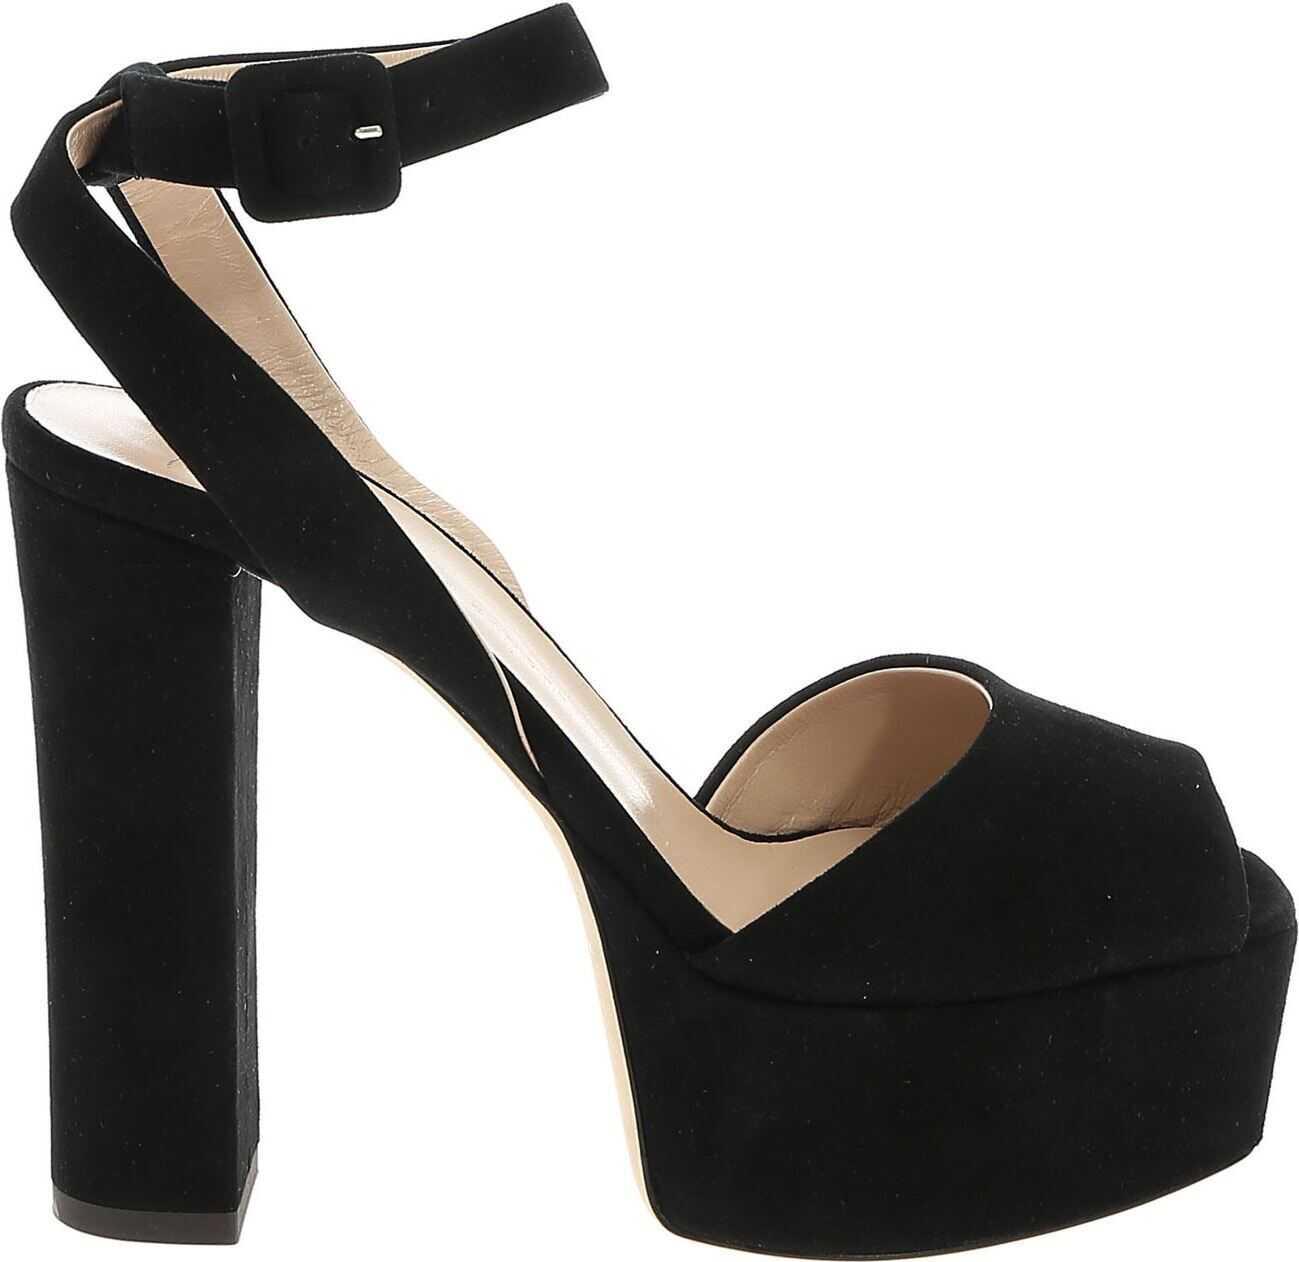 Lavinia Sandals In Black thumbnail